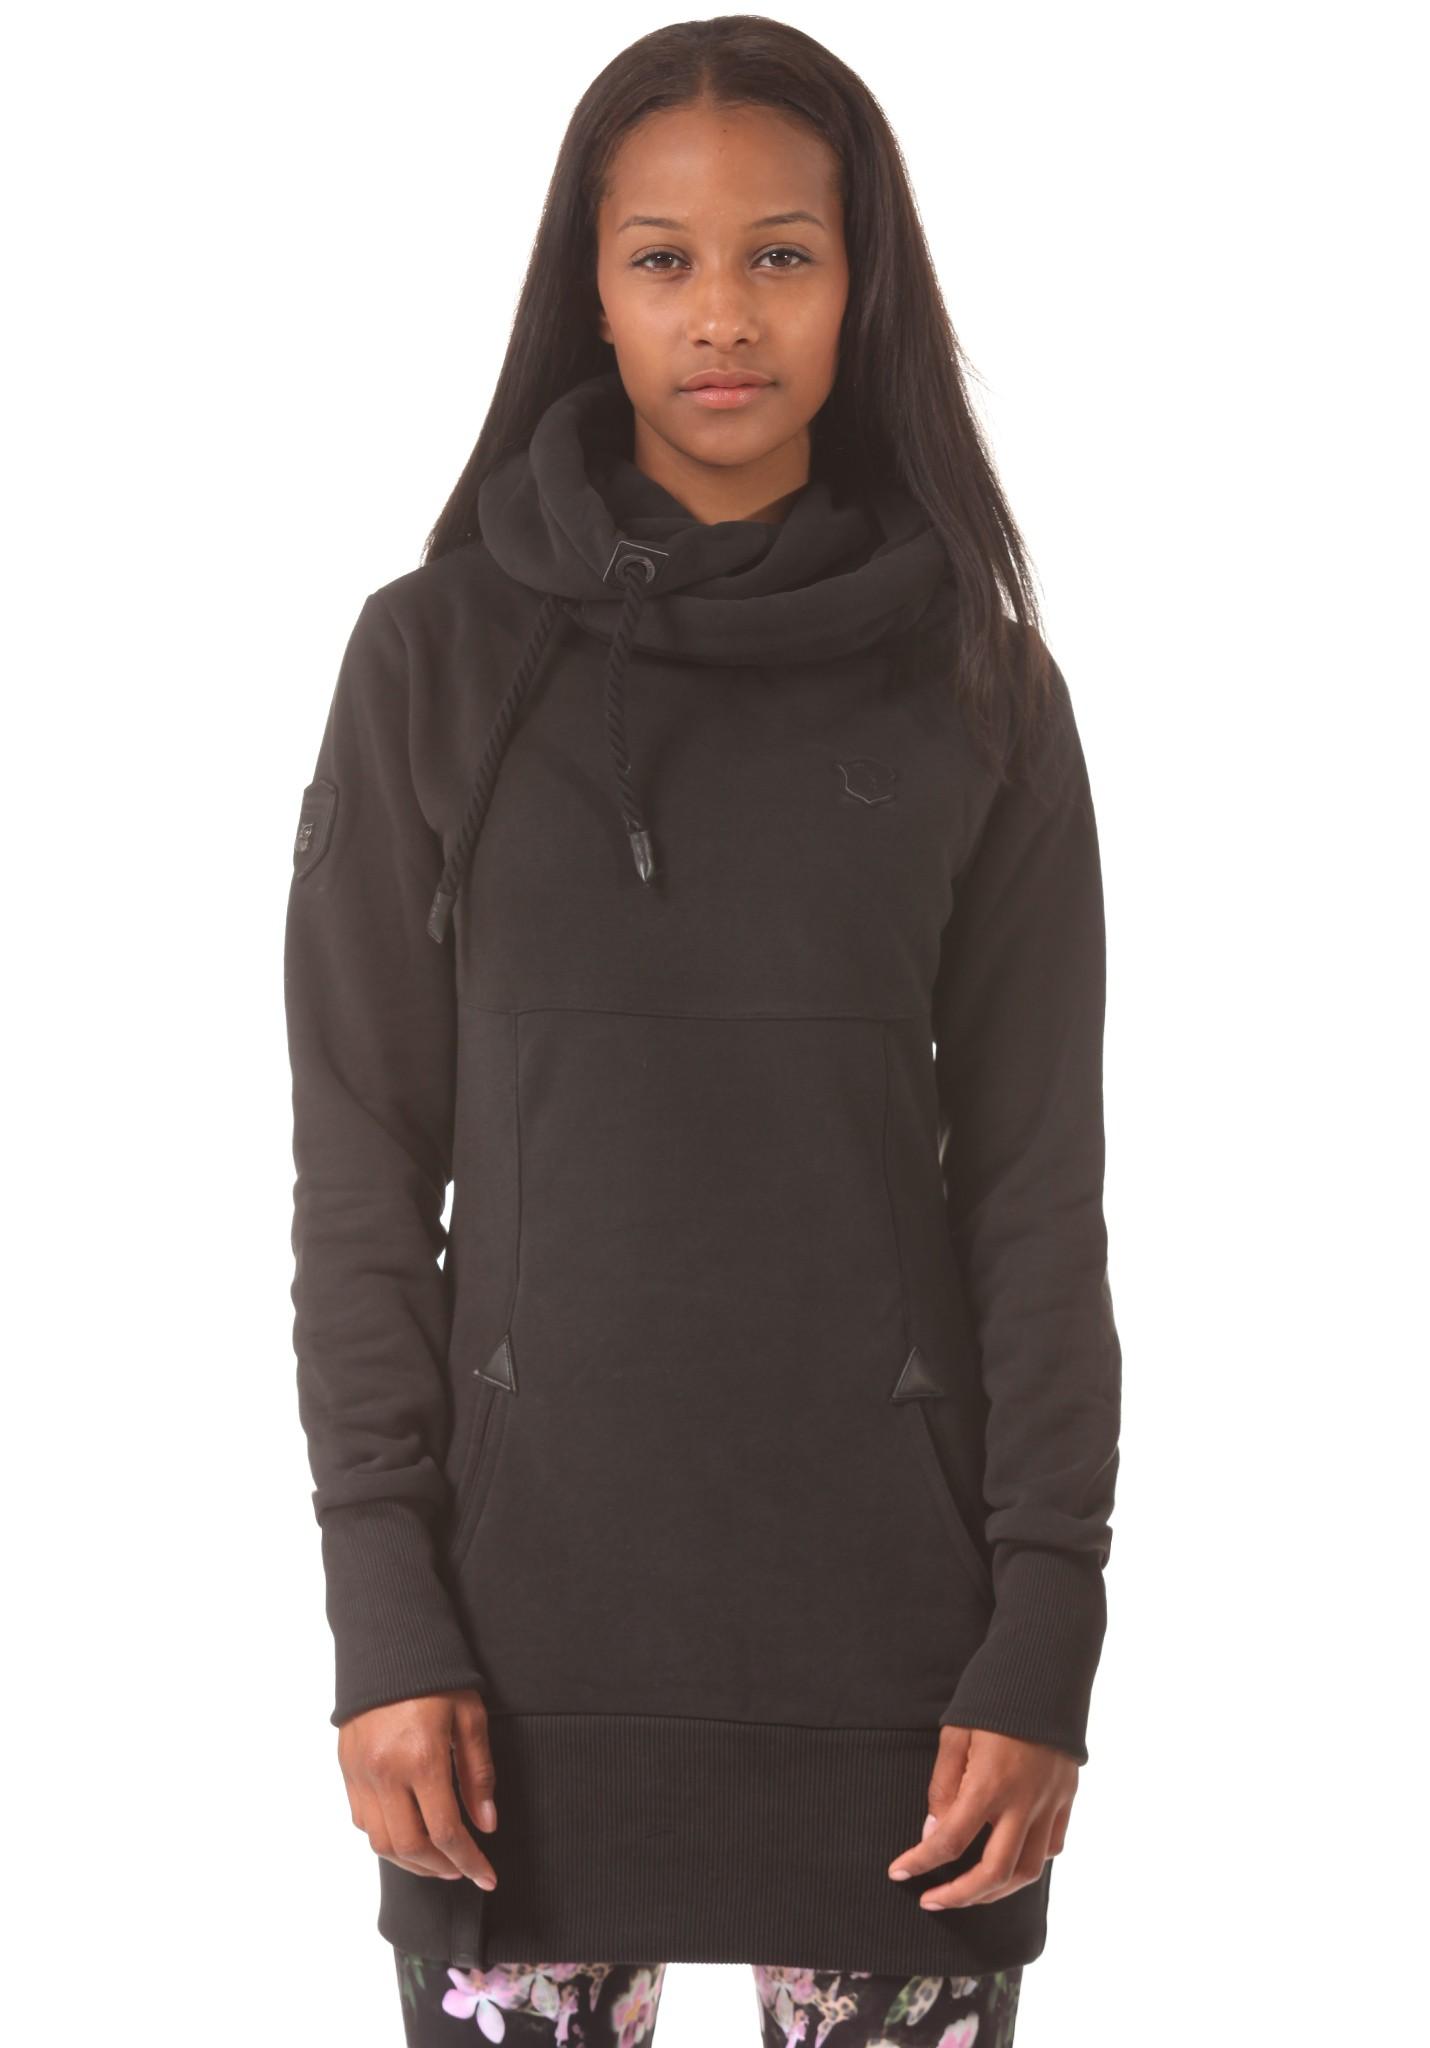 neu naketano lange damen kapuzenpullover pullover hoodie kapuzenjacke ebay. Black Bedroom Furniture Sets. Home Design Ideas